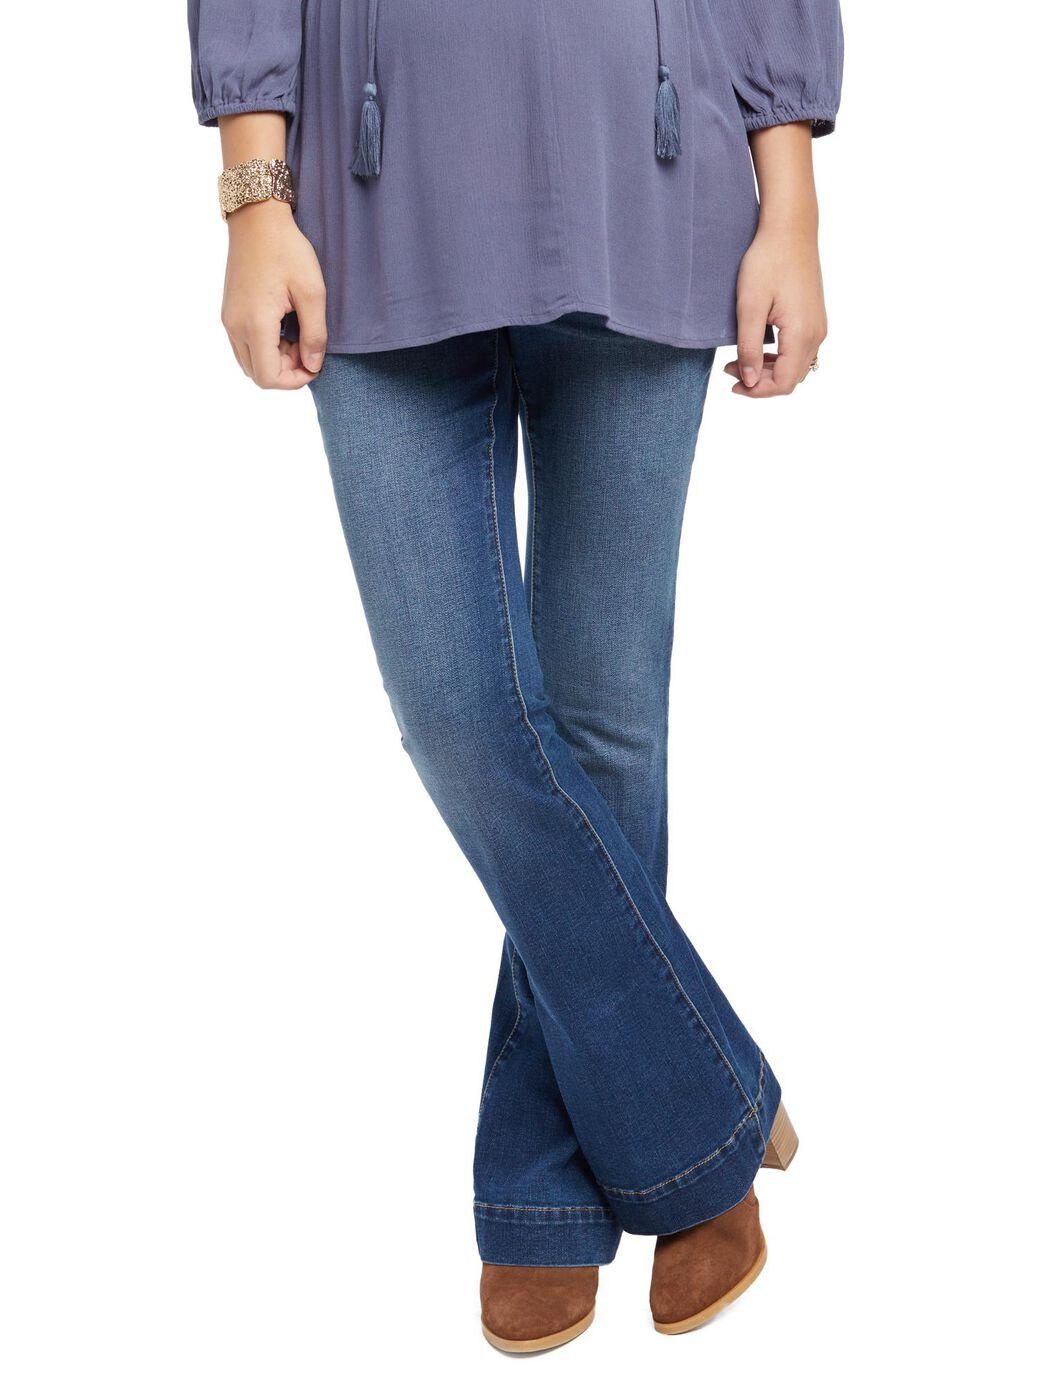 ... Indigo Blue Secret Fit Belly Flare Maternity Jeans, Medium Wash ... - Indigo Blue Secret Fit Belly Flare Maternity Jeans Motherhood